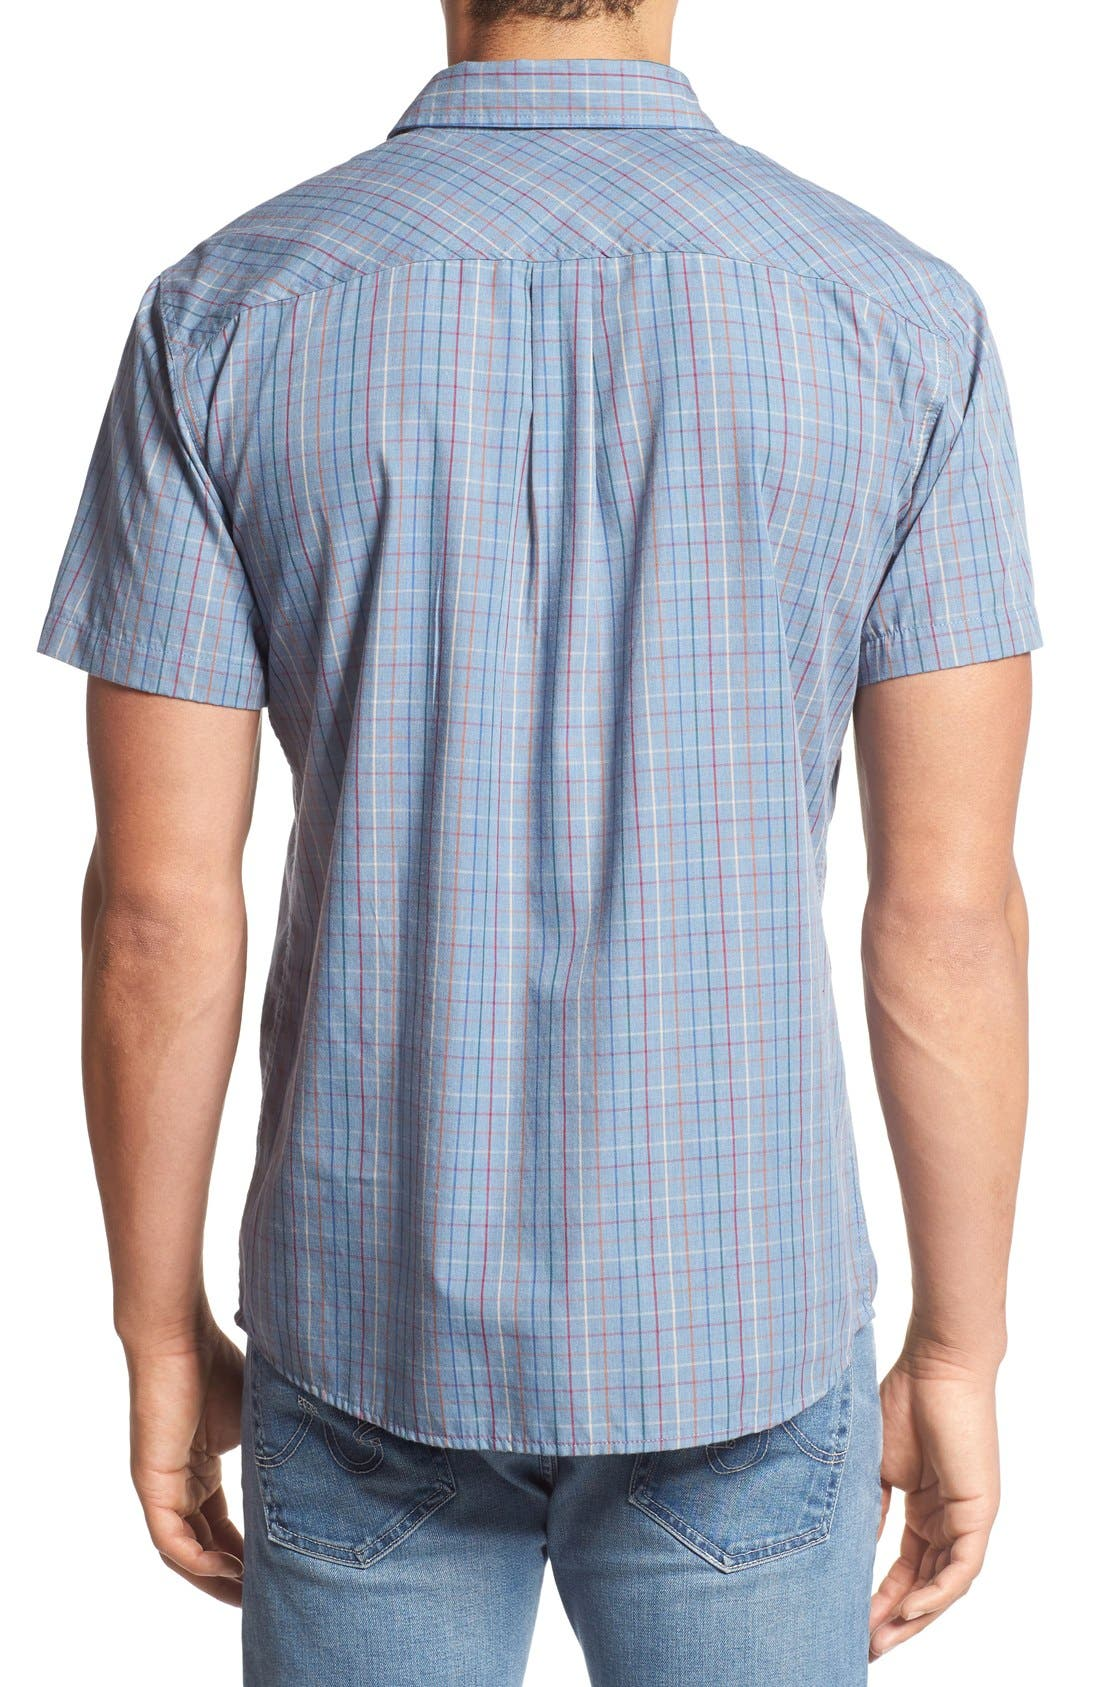 Alternate Image 2  - Brixton 'Memphis' Trim Fit Plaid Short Sleeve Woven Shirt